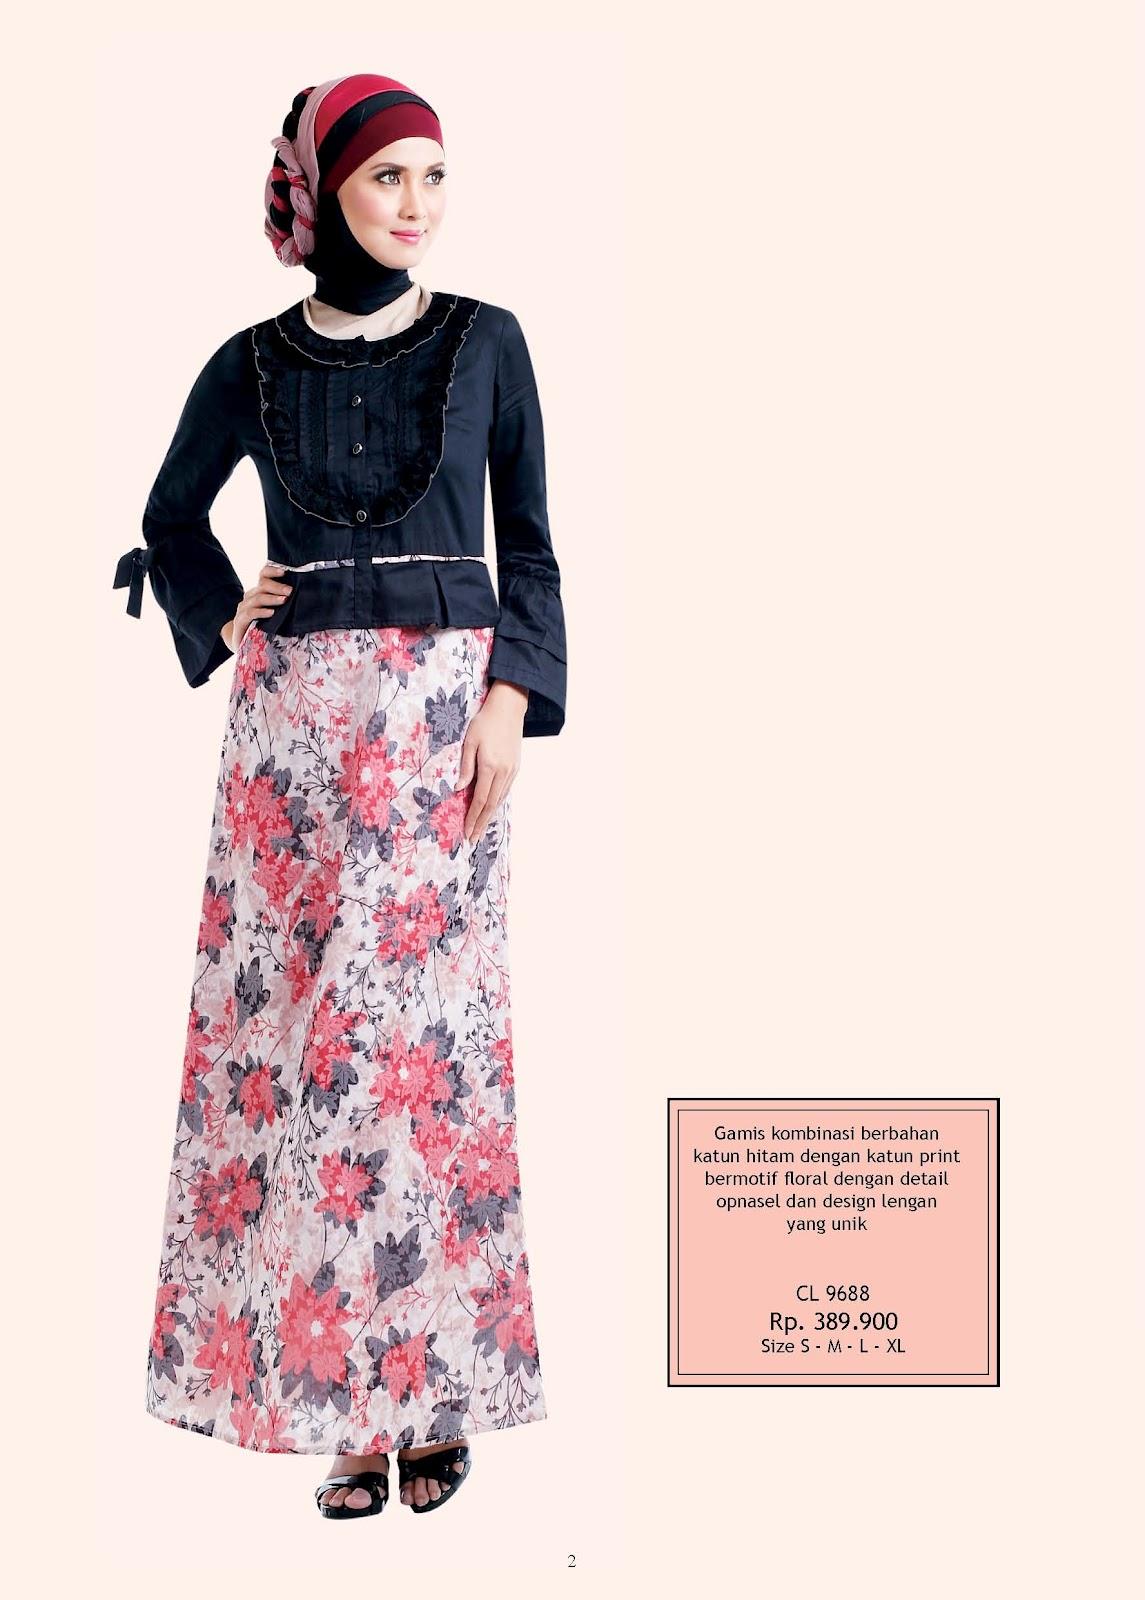 Koleksi Baju April Jasmine Busana Muslim Modern Koleksi